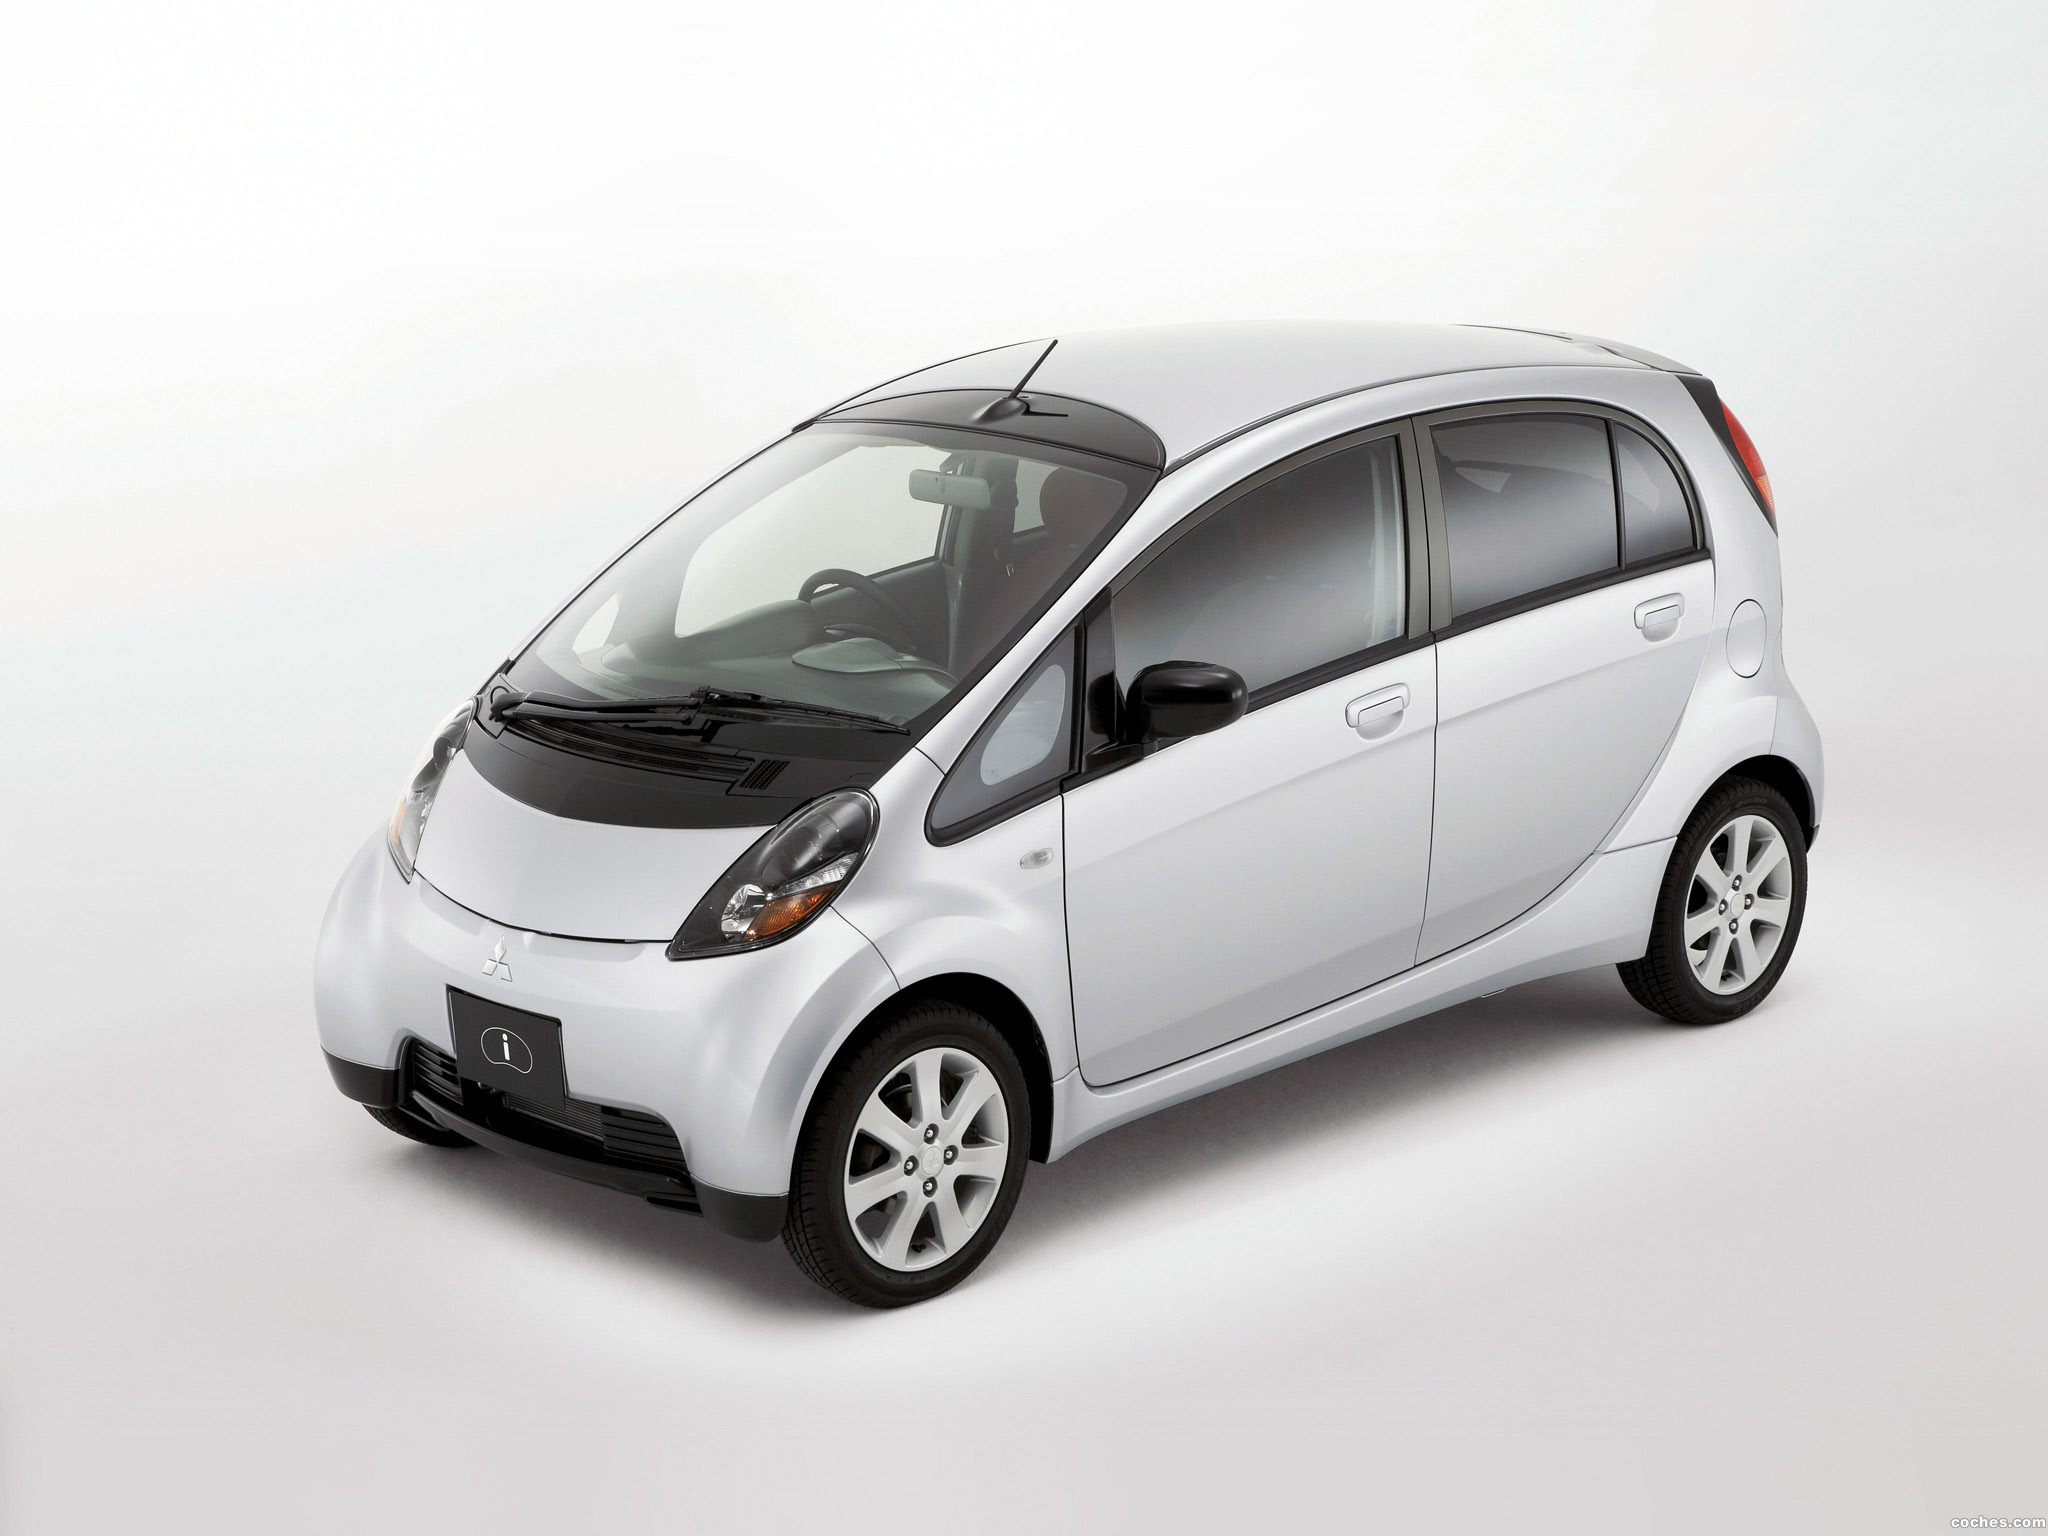 Foto 1 de Mitsubishi I 2006